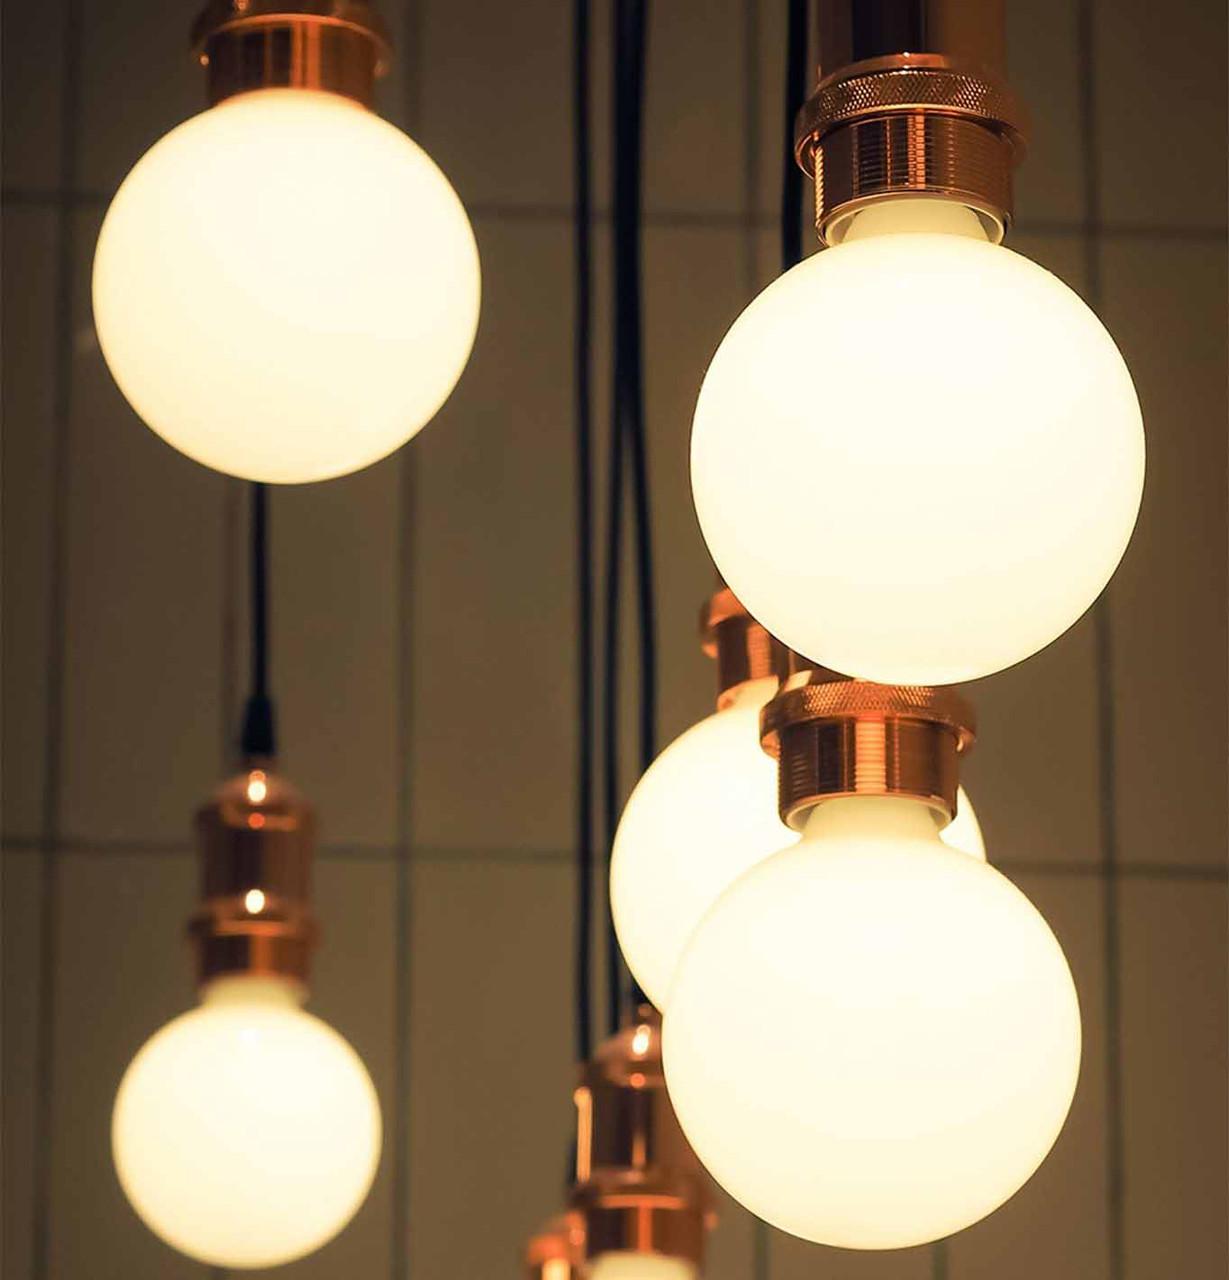 Crompton Lamps LED Globe 2200K Light Bulbs